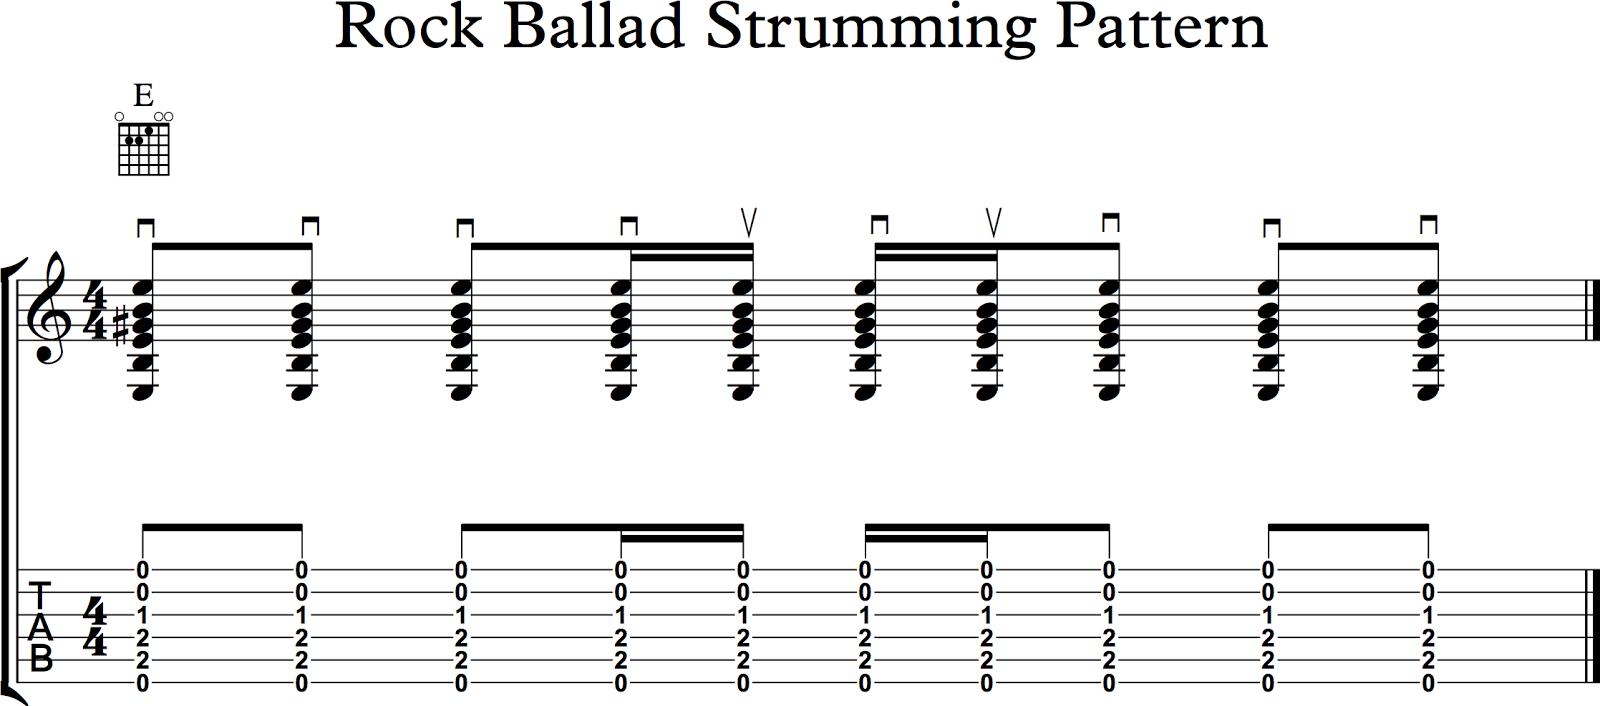 Guitar Strumming Patterns Awesome Design